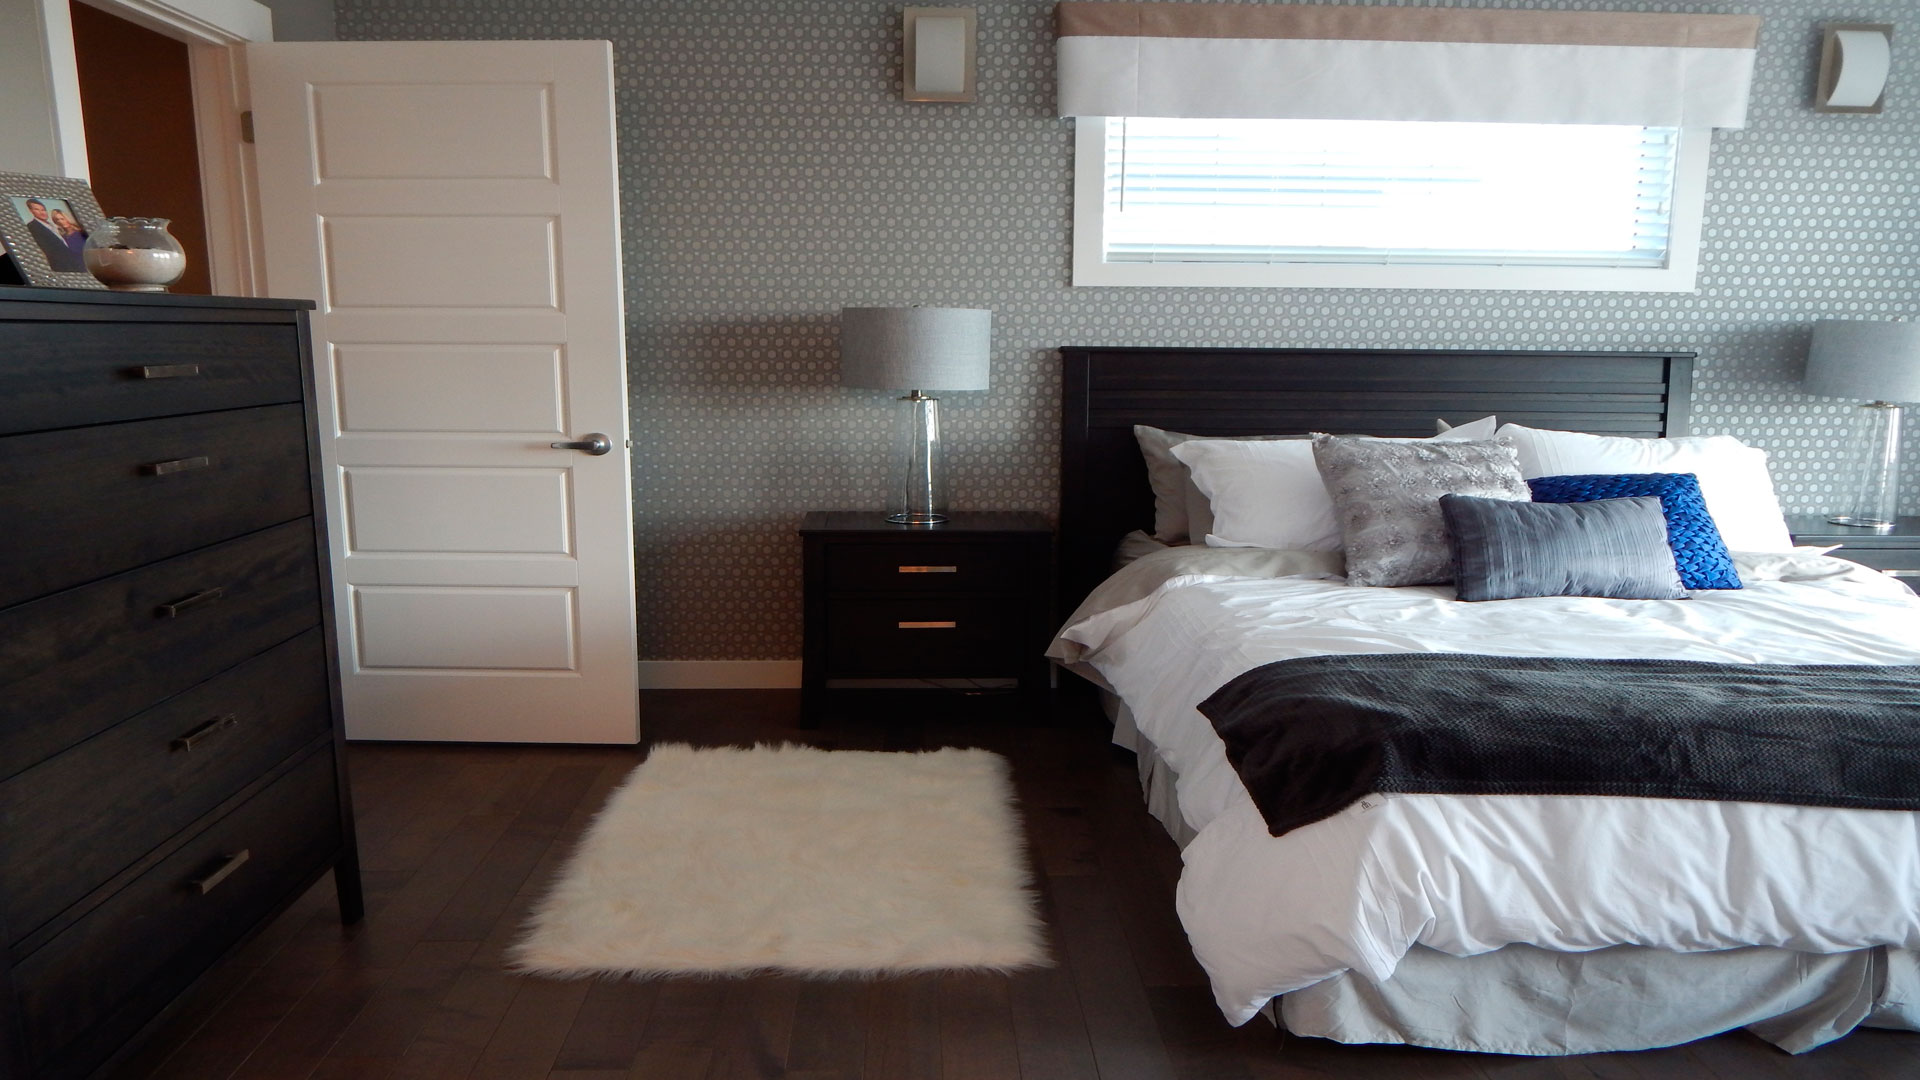 amueblar-un-dormitorio-de-matrimonio-pequenho-1920